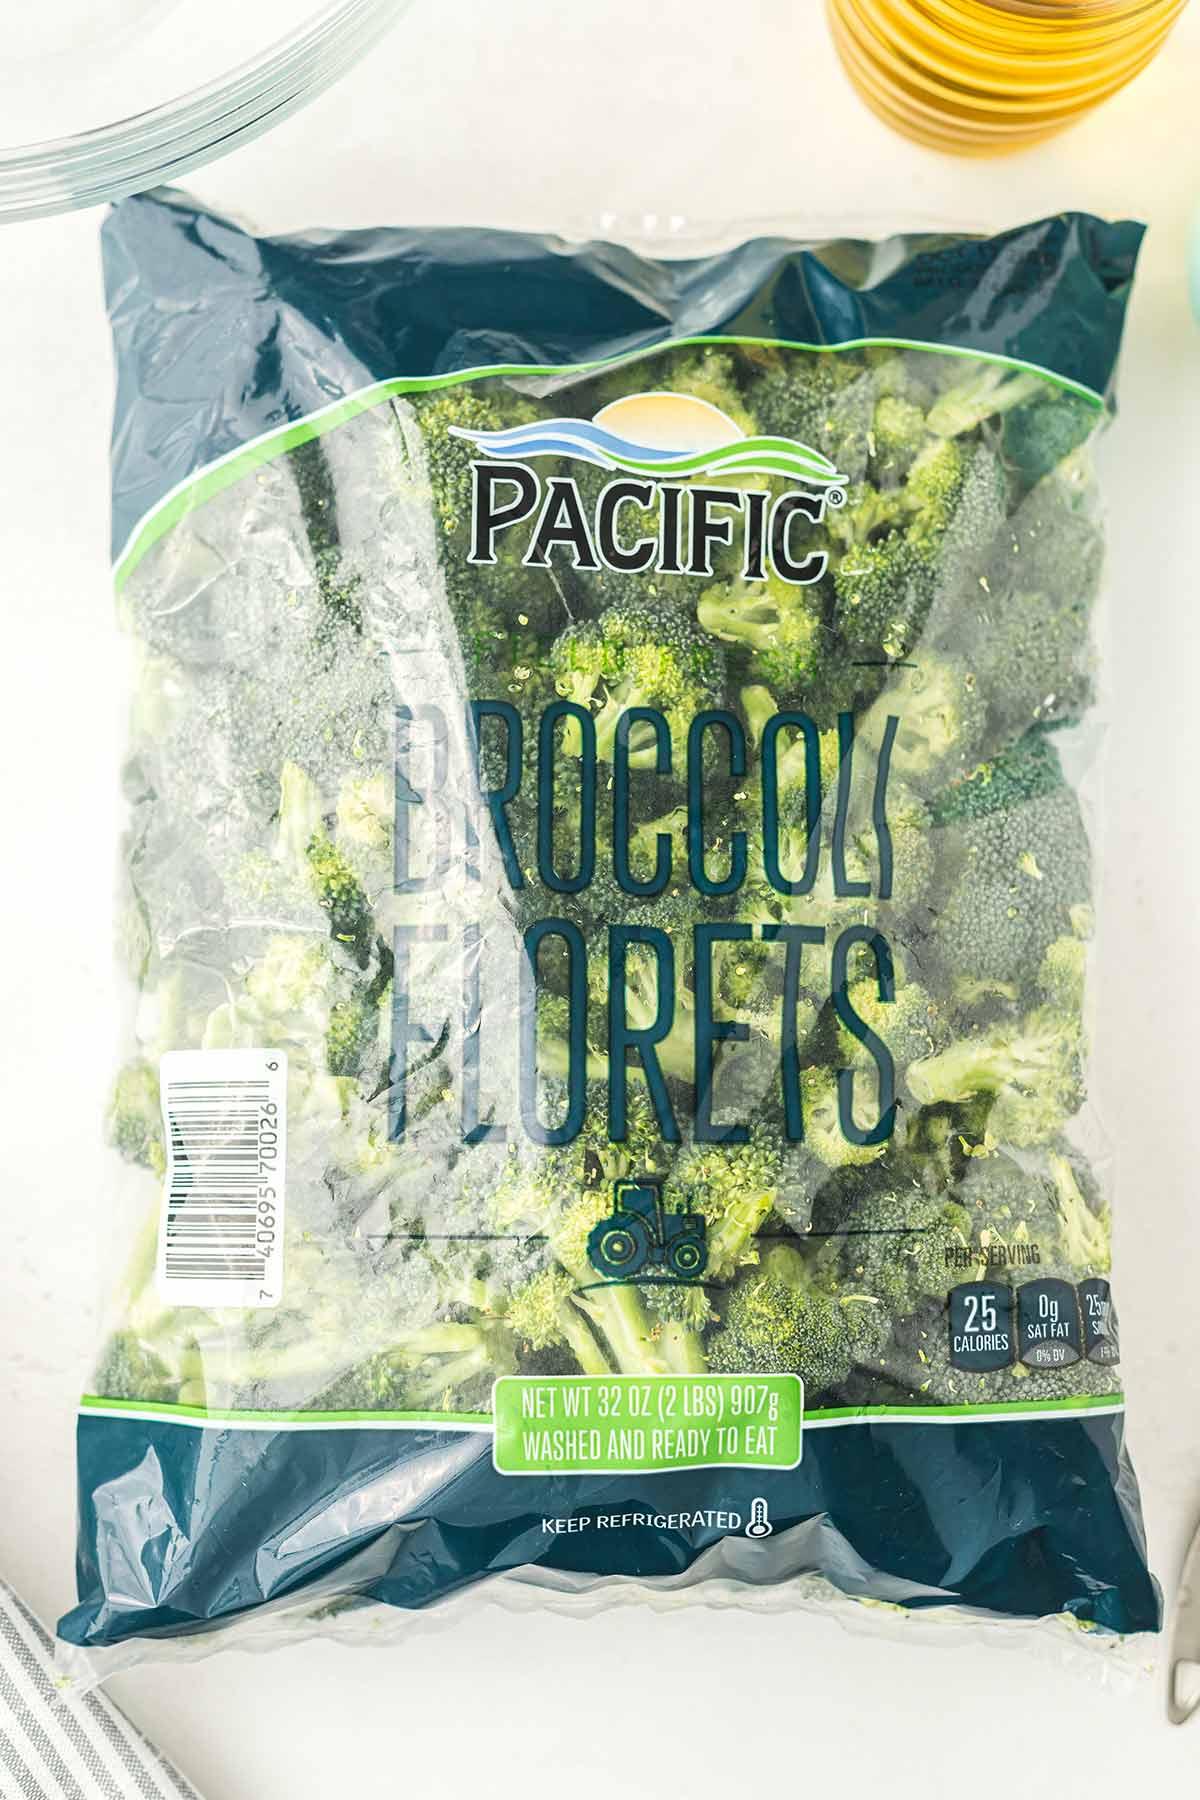 Overhead shot showing bag of broccoli florets.